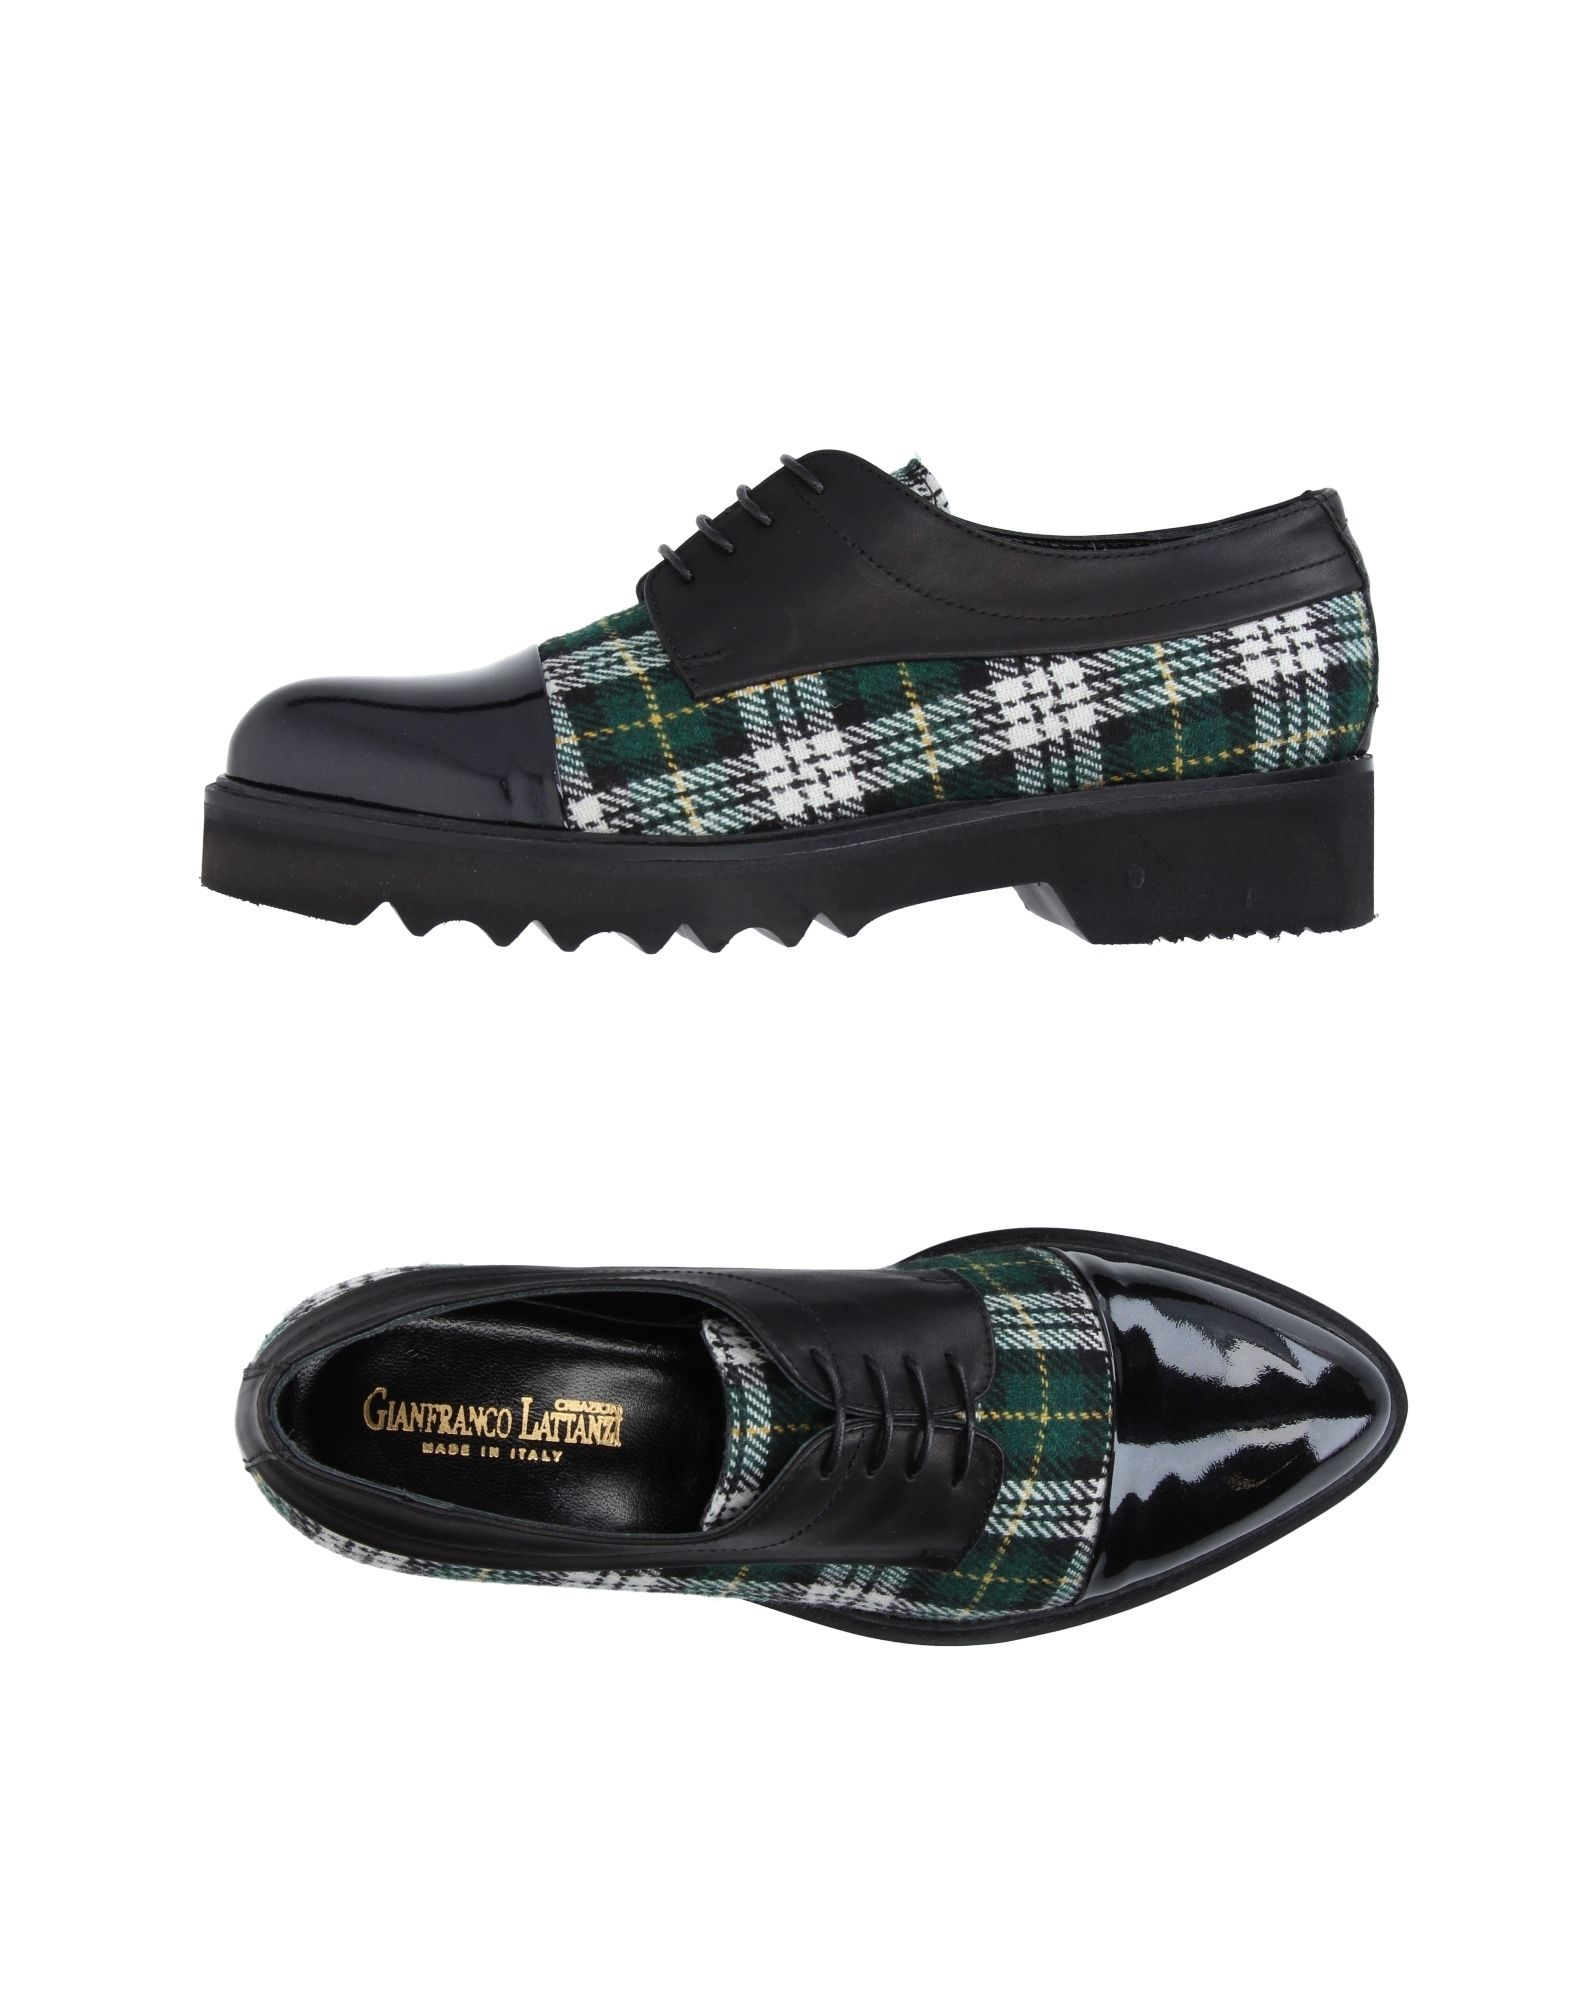 Gianfranco Lattanzi Schnürschuhe Damen  11228784LN Gute Qualität beliebte Schuhe